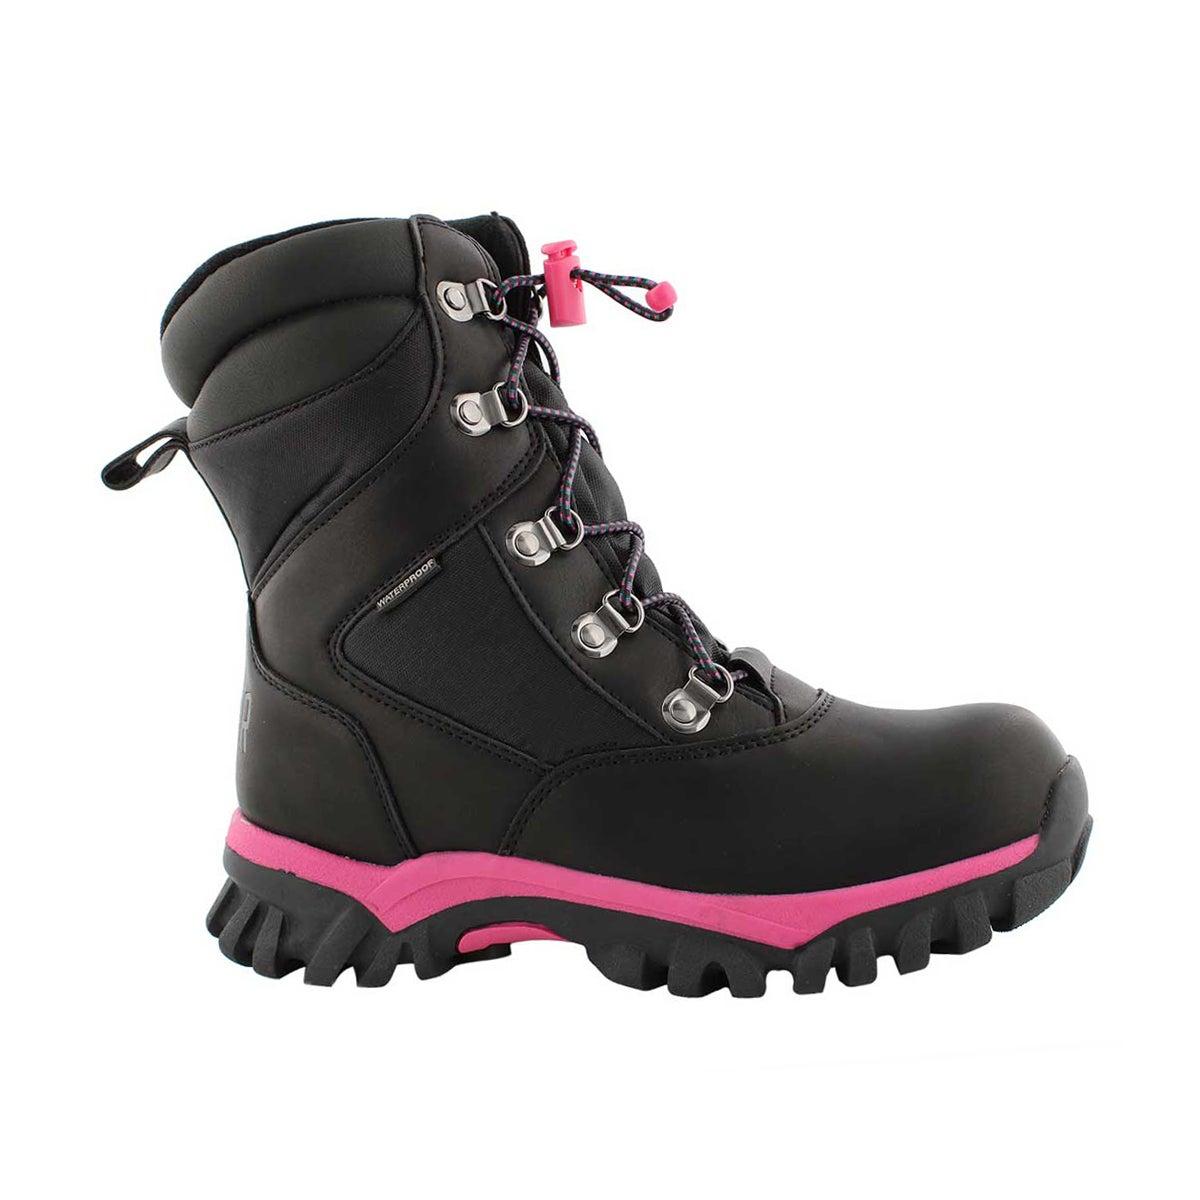 Grls Tabby blk wtpf winter boot